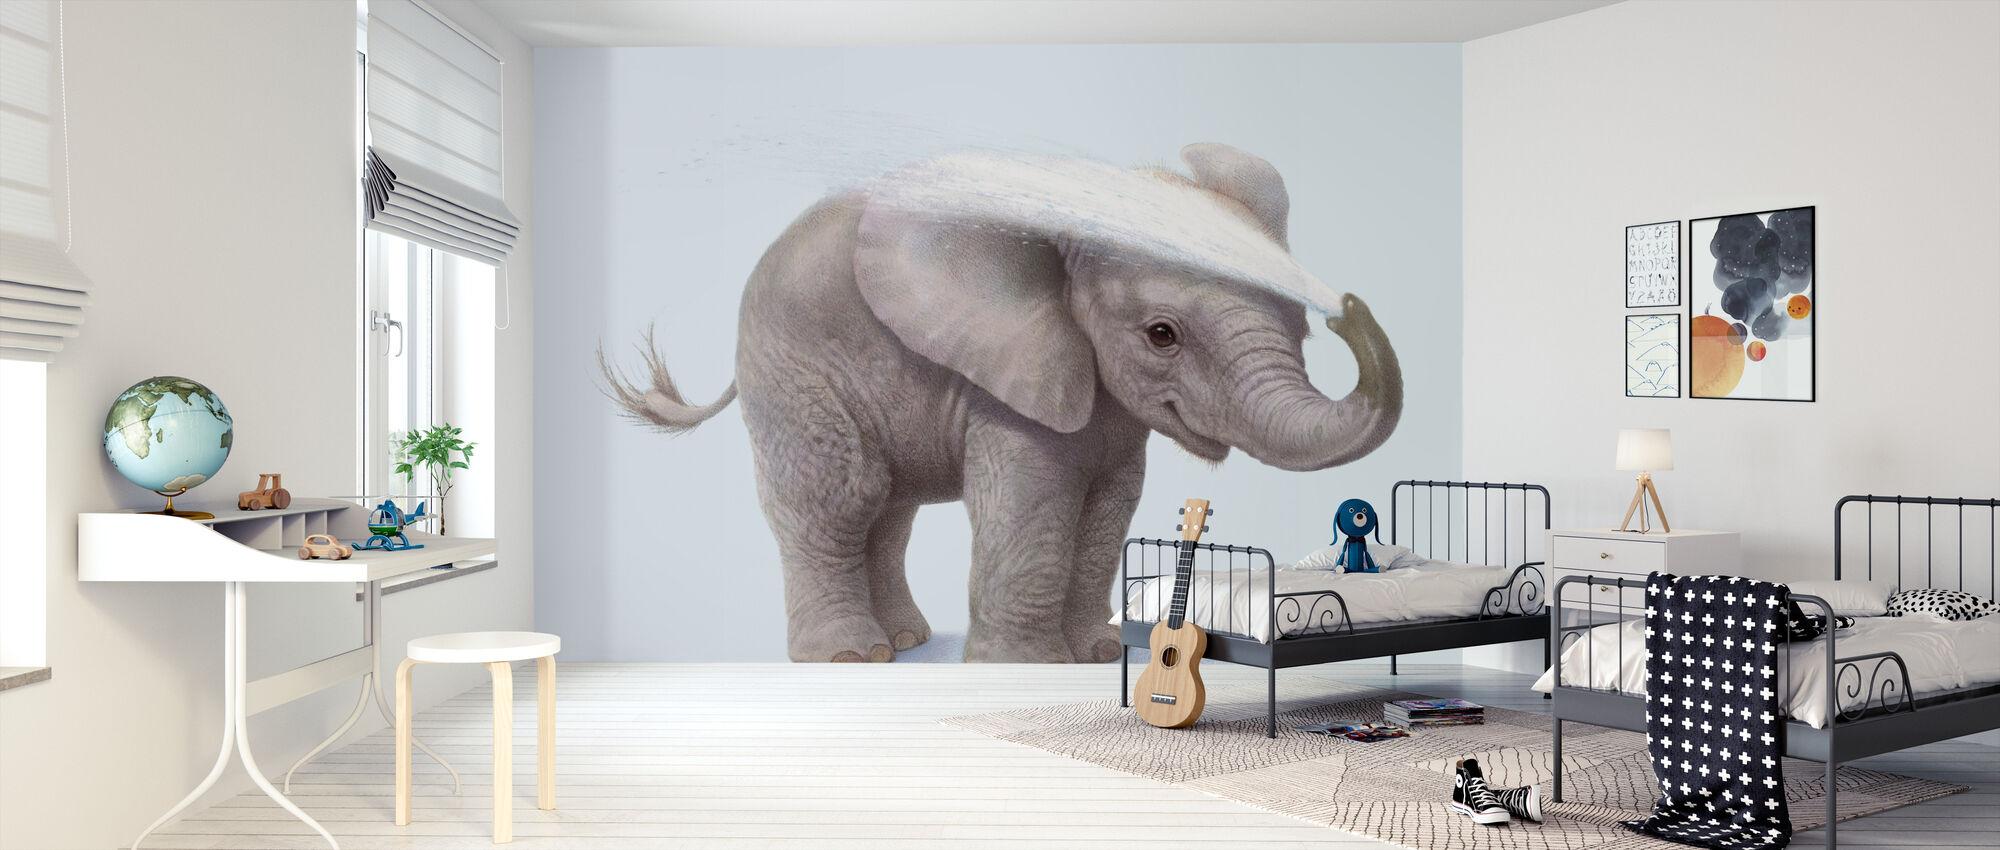 Elephant Calf Washing - Wallpaper - Kids Room